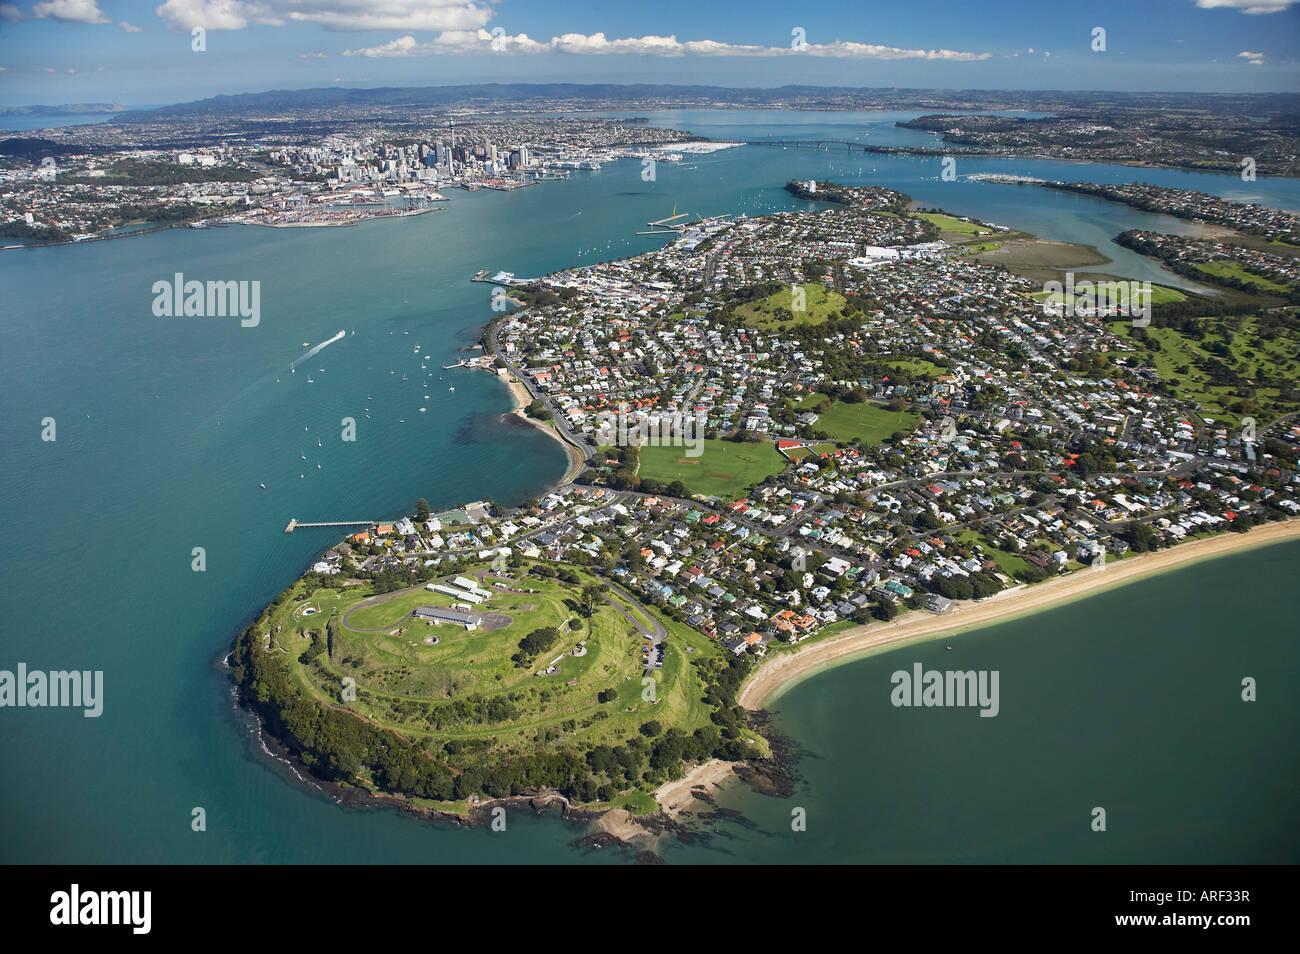 North Head Devonport Auckland North Island New Zealand Aerial Stock Photo - Alamy